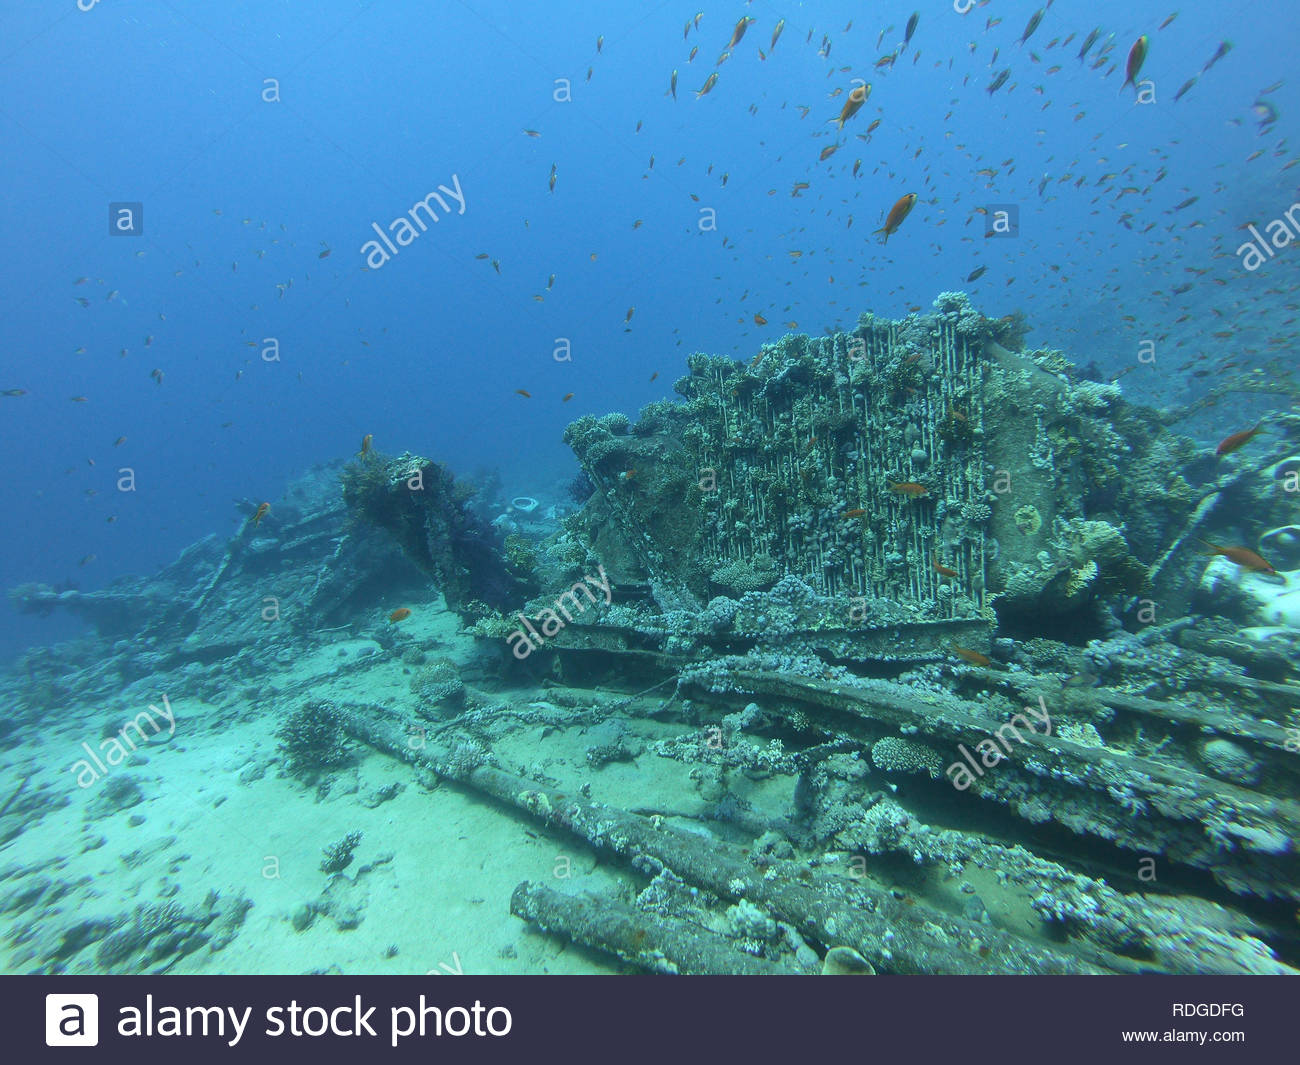 The Wreck of the Yolanda (Jolanda) off Shark Reef in Ras Mohammed National Park near Sharm El Sheikh, Egypt - Stock Image